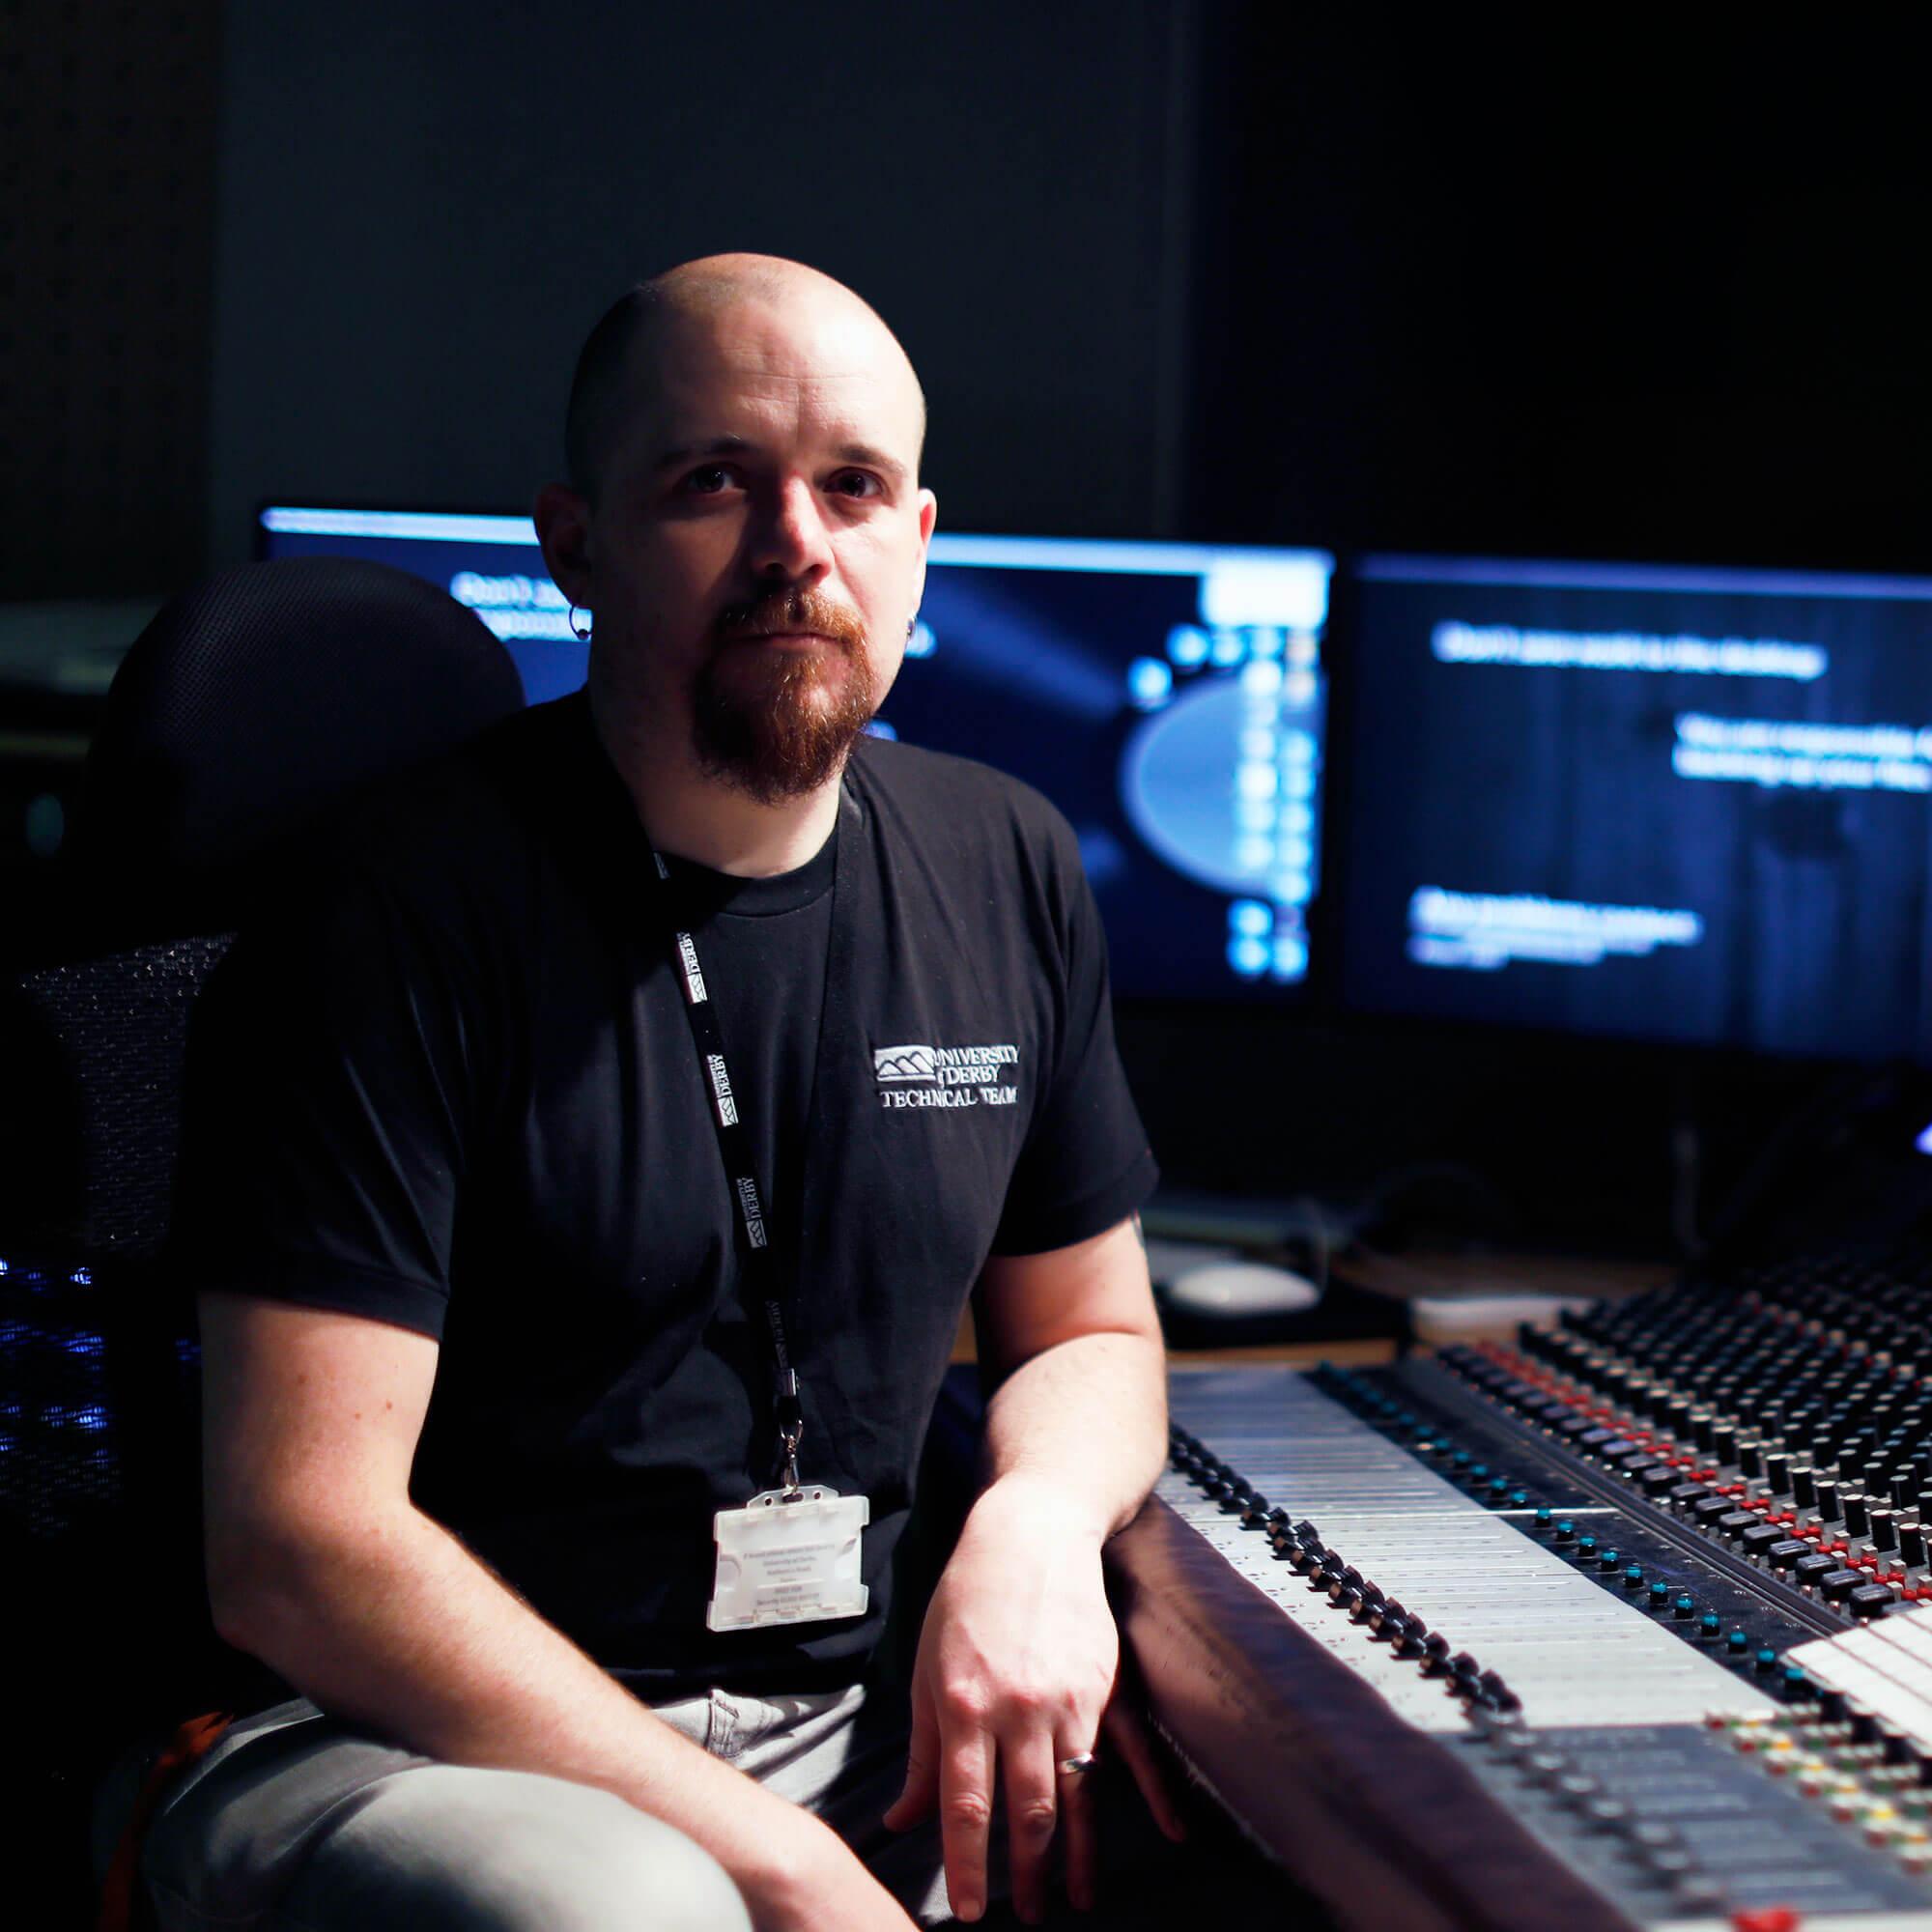 Mark Randell in an audio lab.